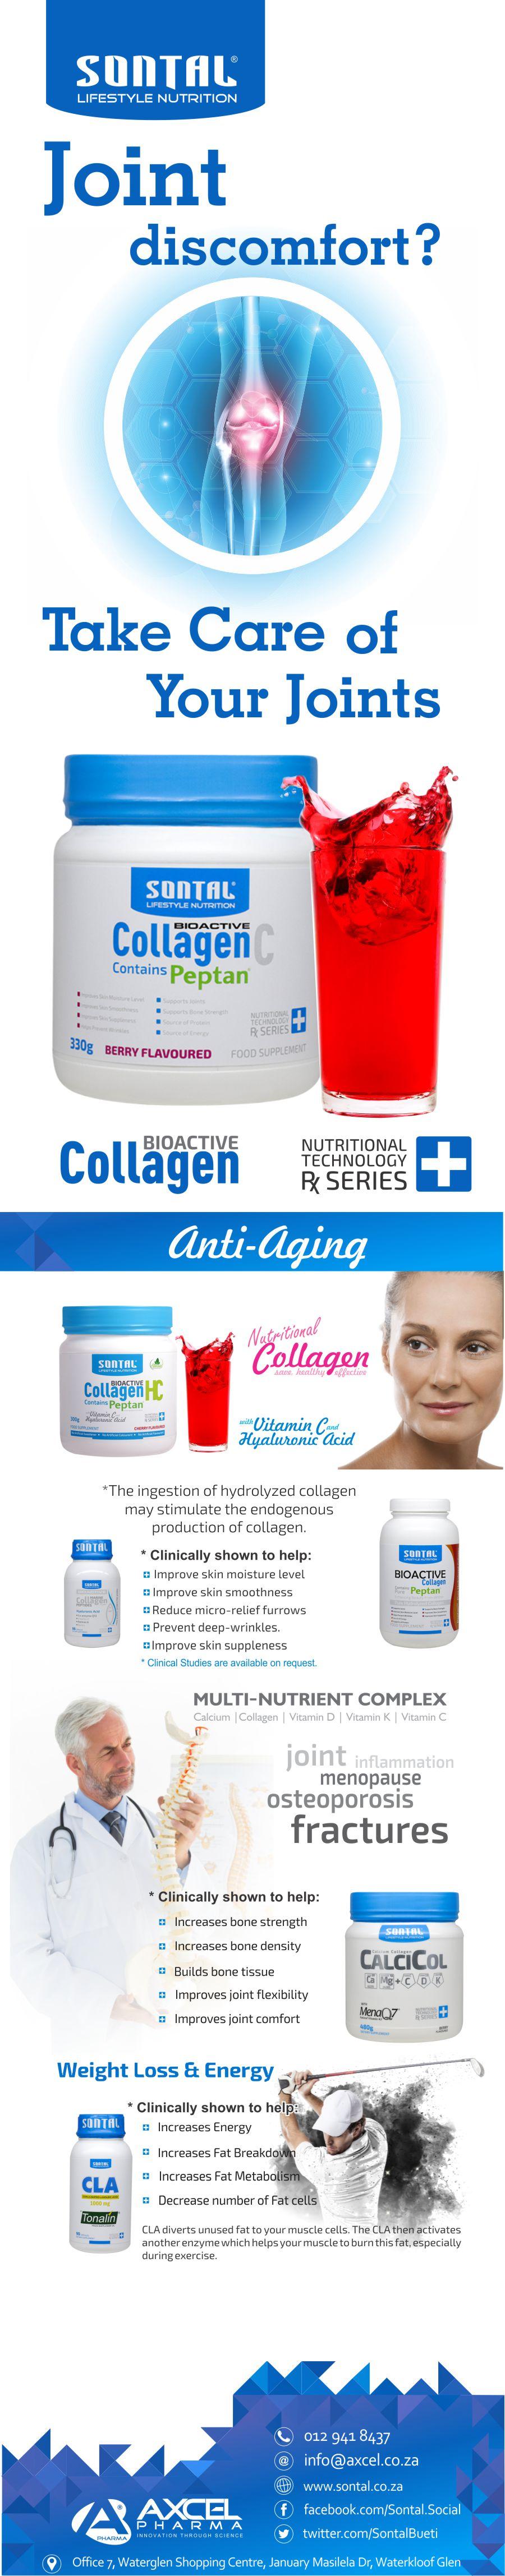 BioActive Collagen Joint & Bone Health – Strip Image